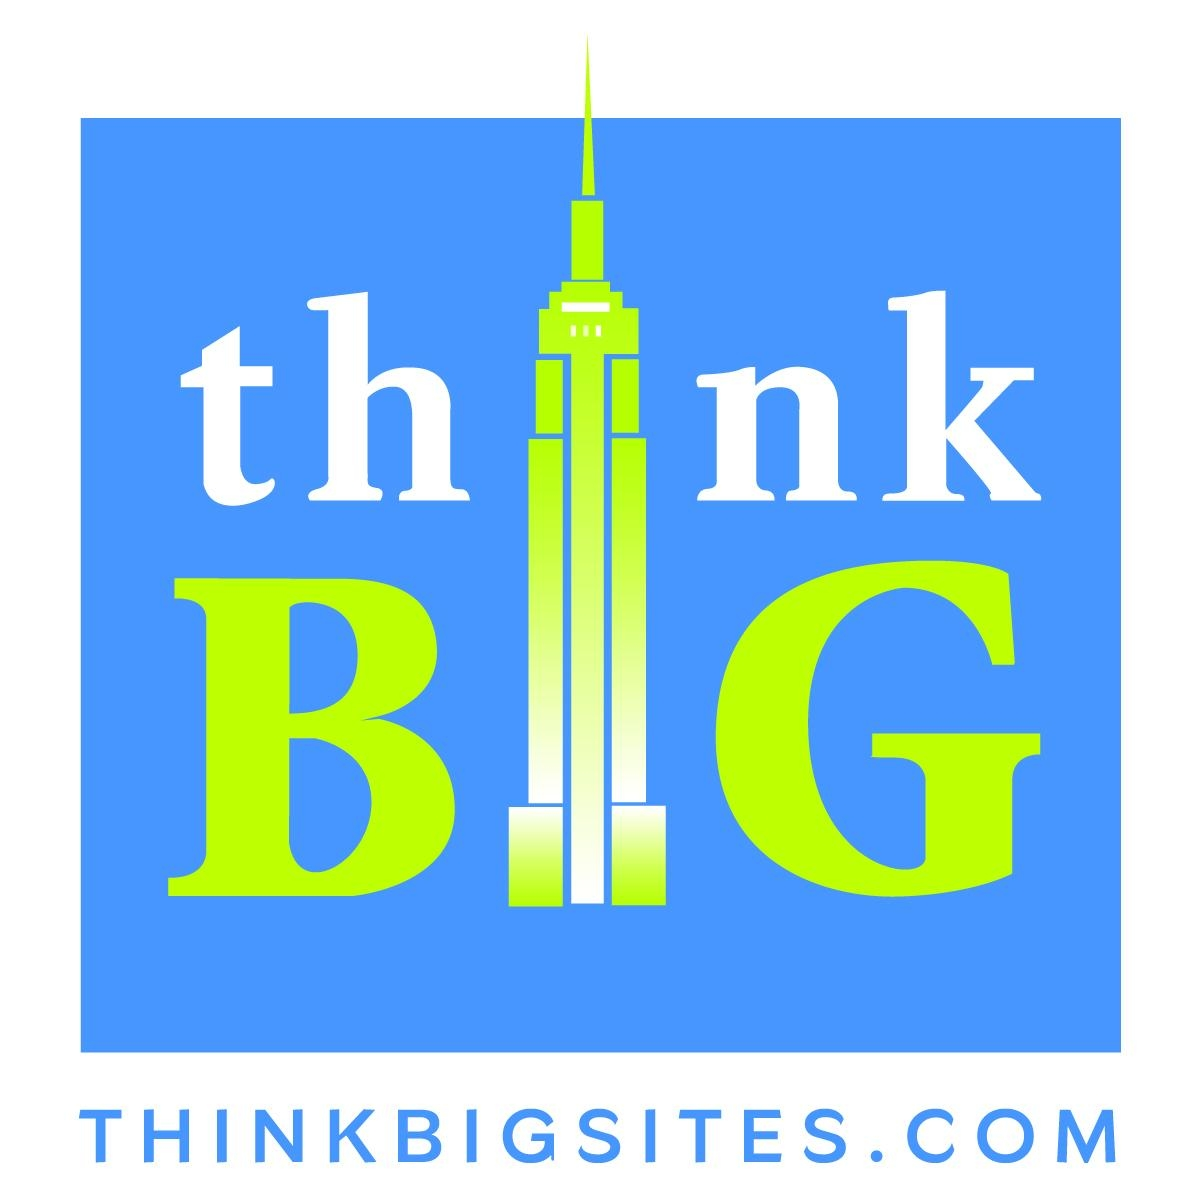 thinkBIGsites.com